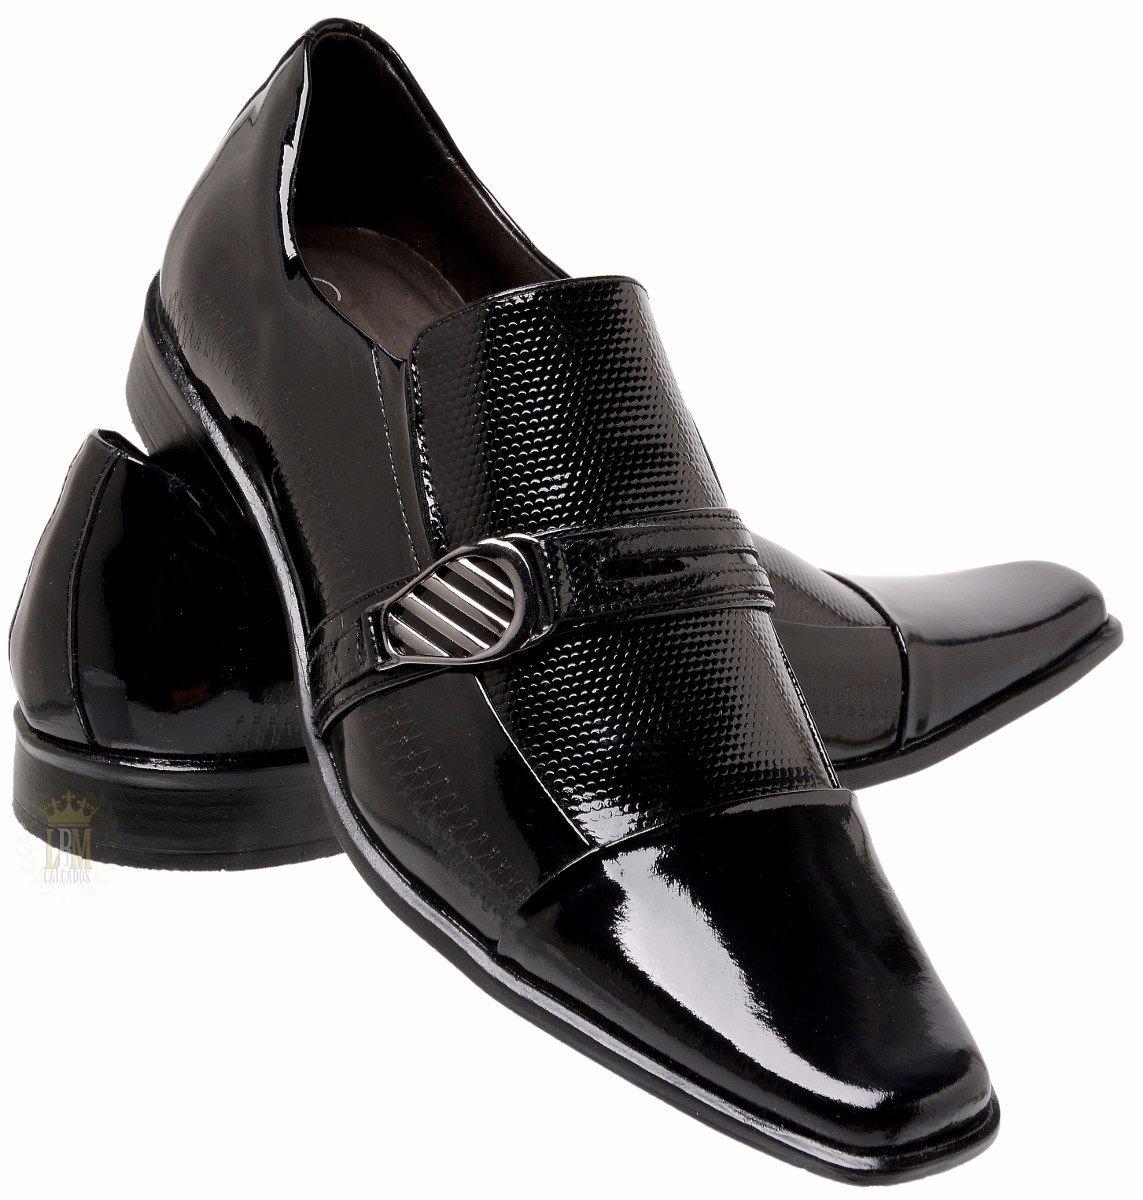 0eab6f832 sapato social preço de atacado couro legitimo + brinde. Carregando zoom.